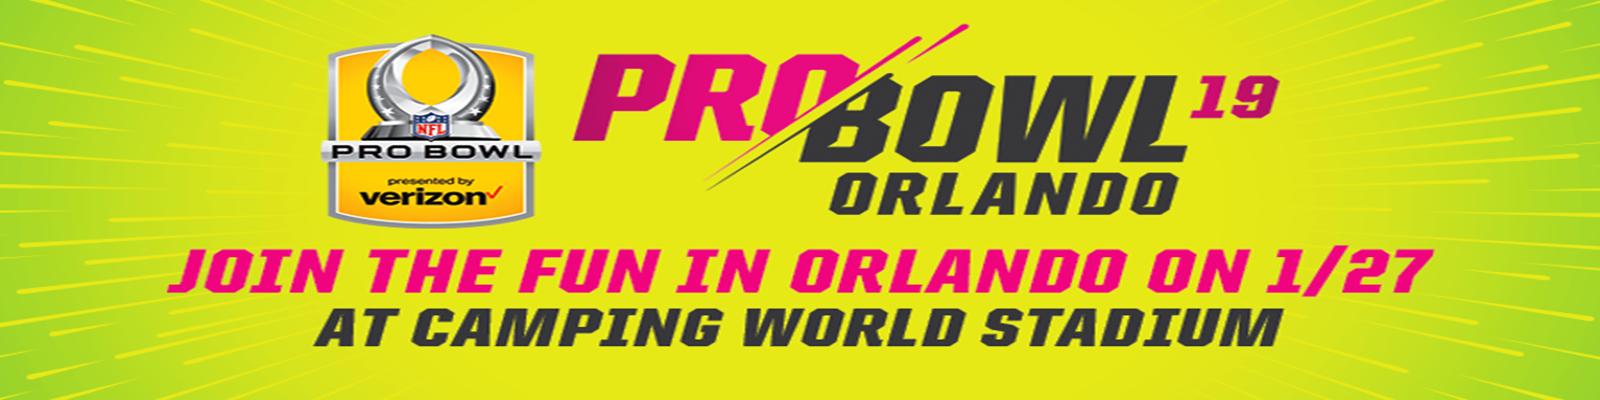 ORLANDO, Fla. (FNN SPORTS) - 2019 NFL PRO BOWL TICKETS ON SALE NOW